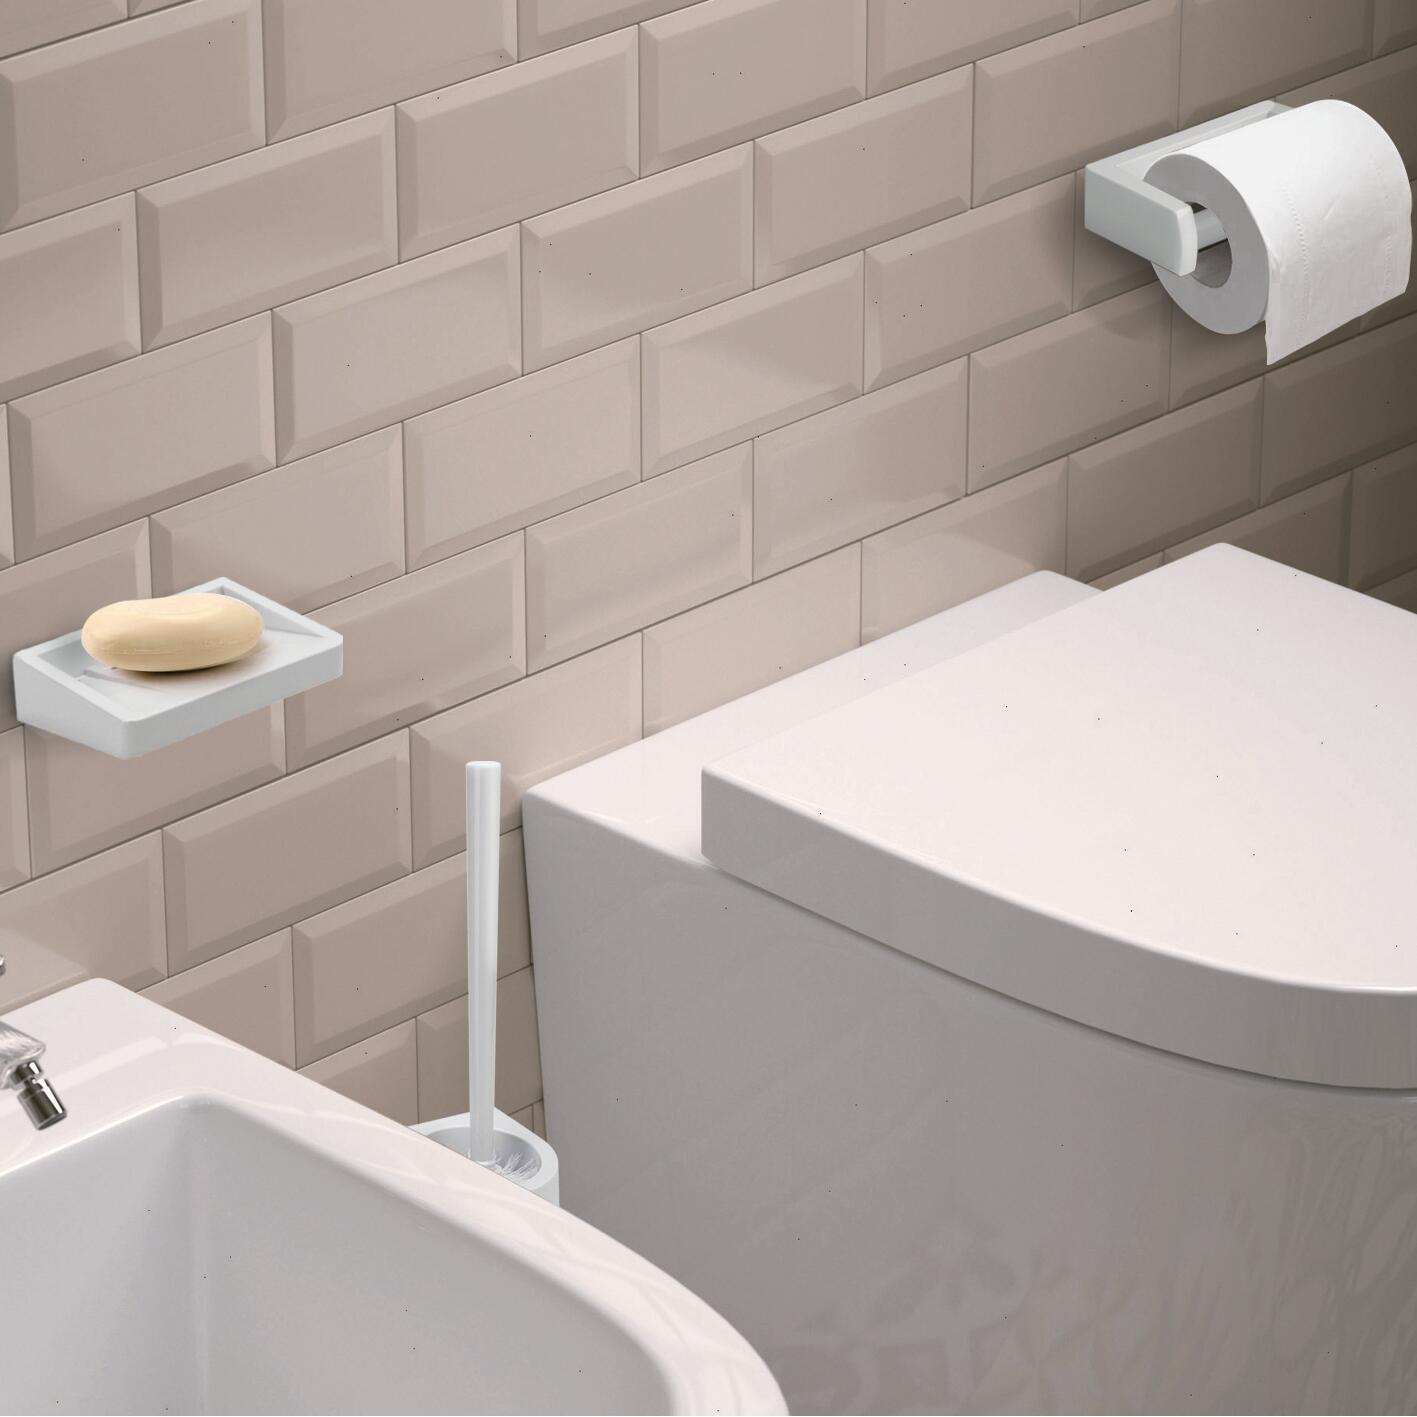 Porta scopino wc a muro in abs bianco - 4